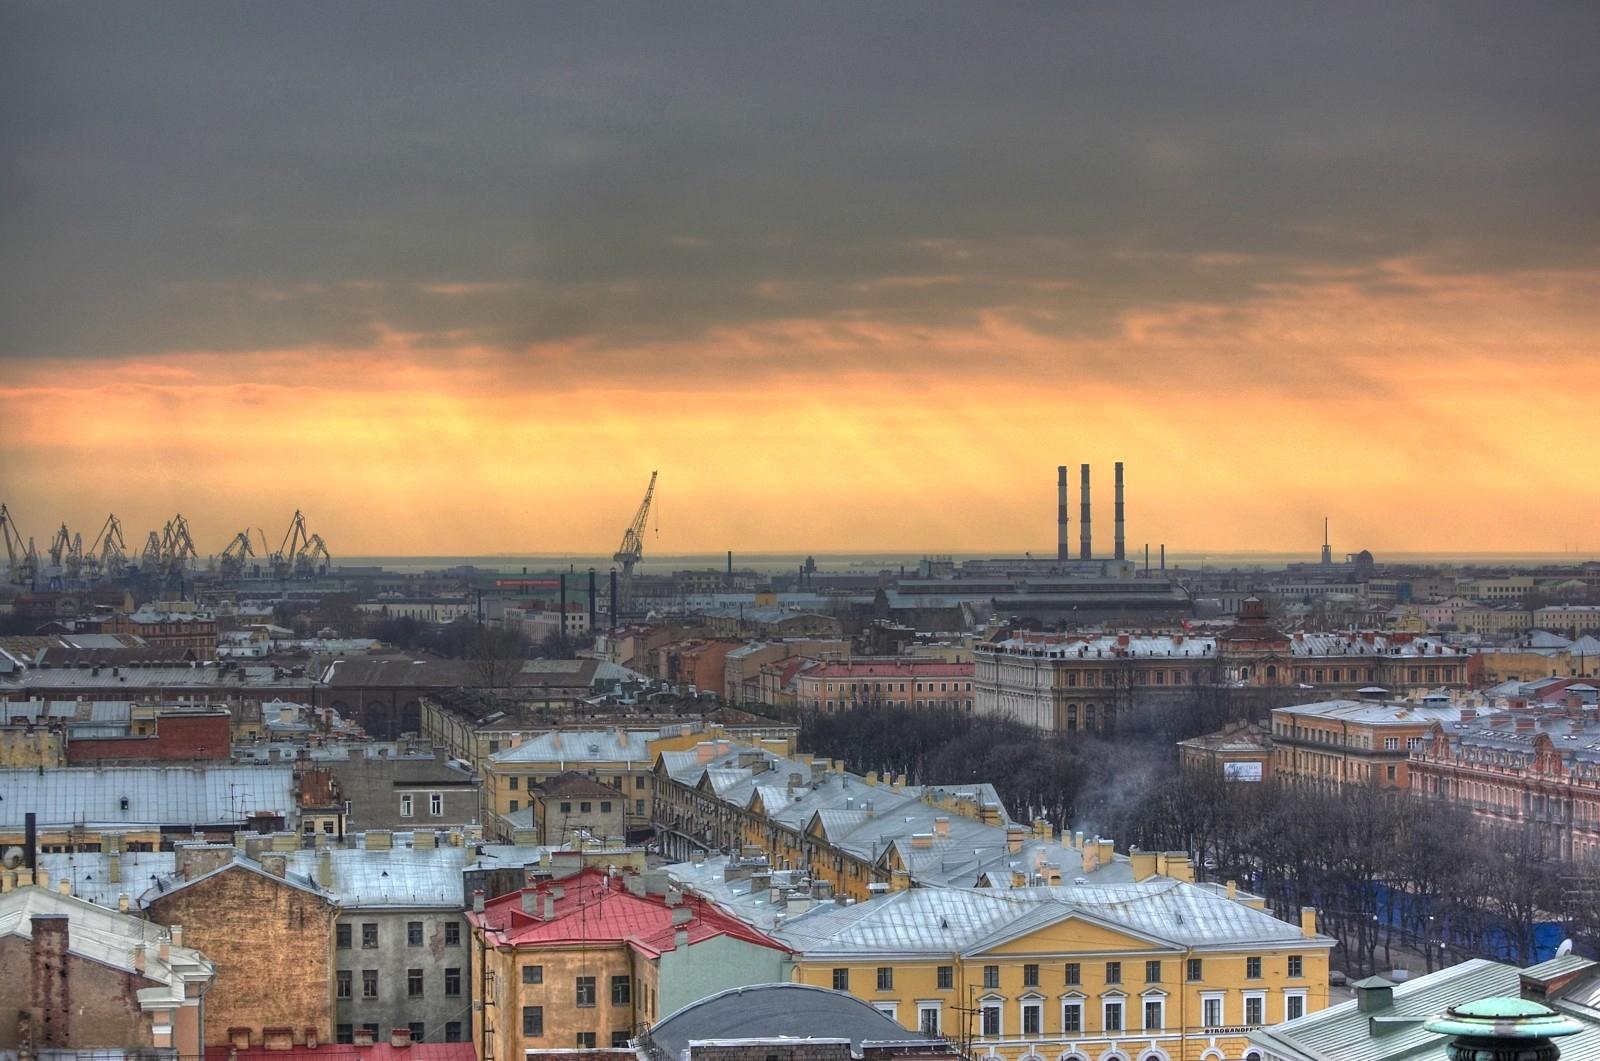 знакомства по фотографии санкт петербург